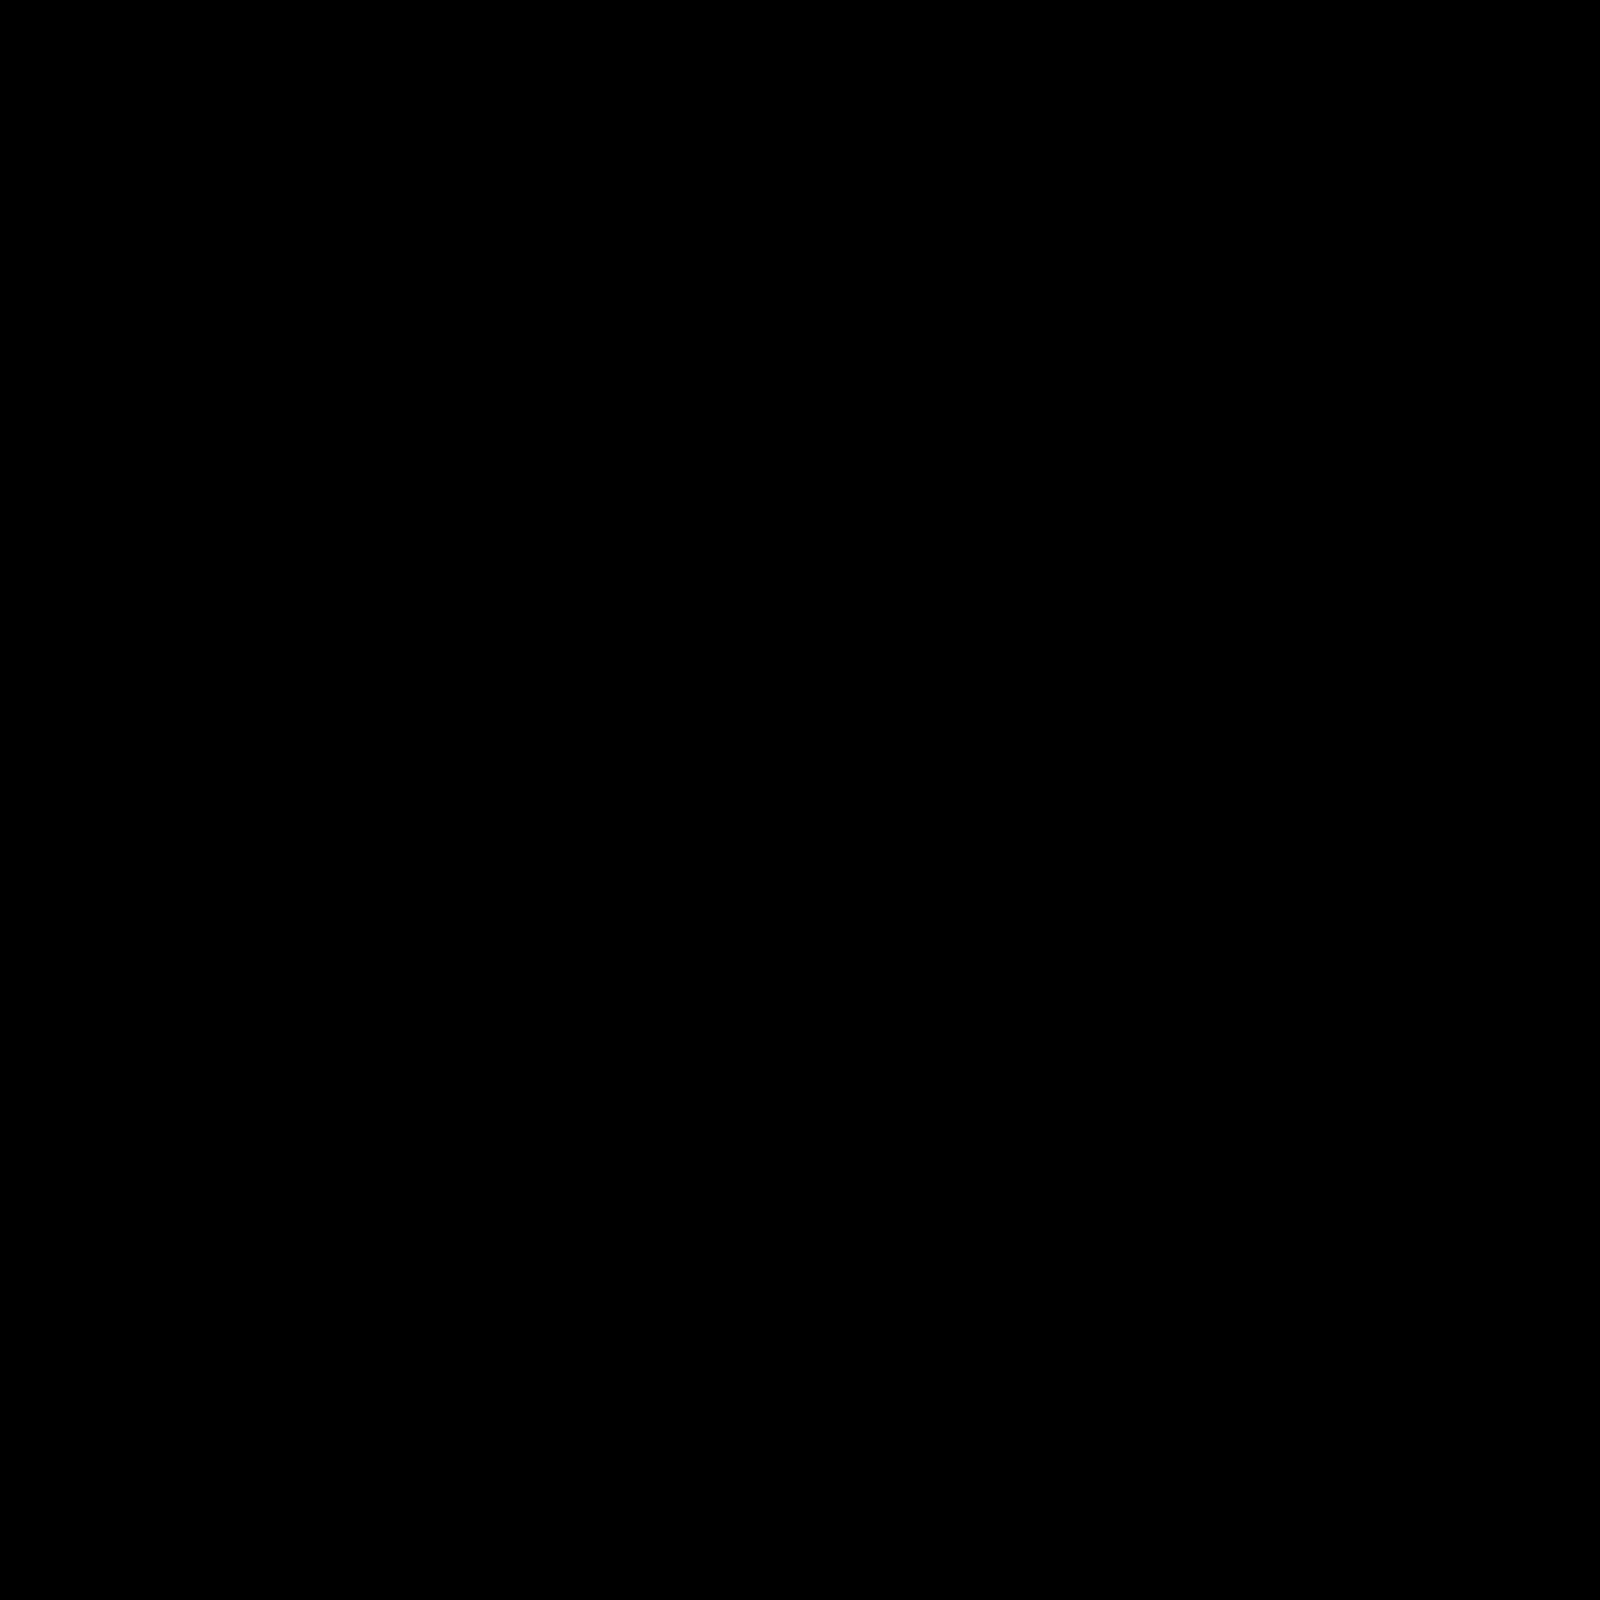 Drop Shipping icon